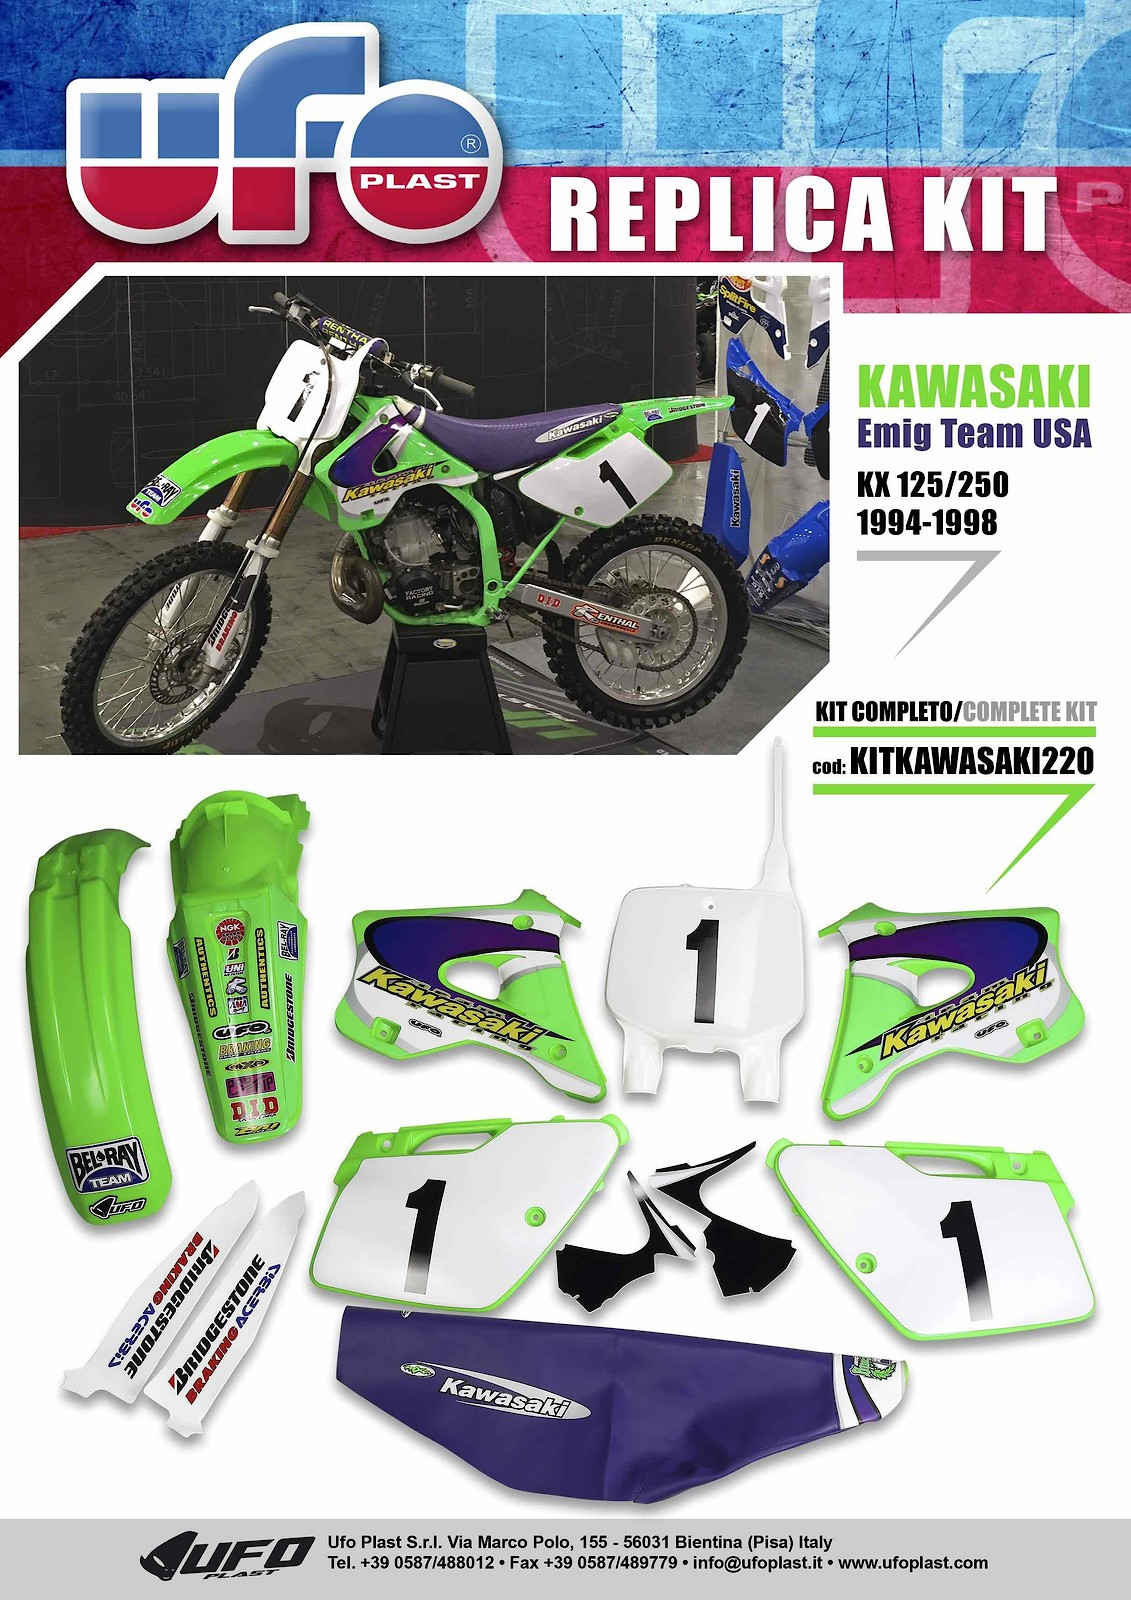 UFO Complete Retro Kits - Kawasaki 96-98 - UFO Plast USA - Motocross Pictures - Vital MX